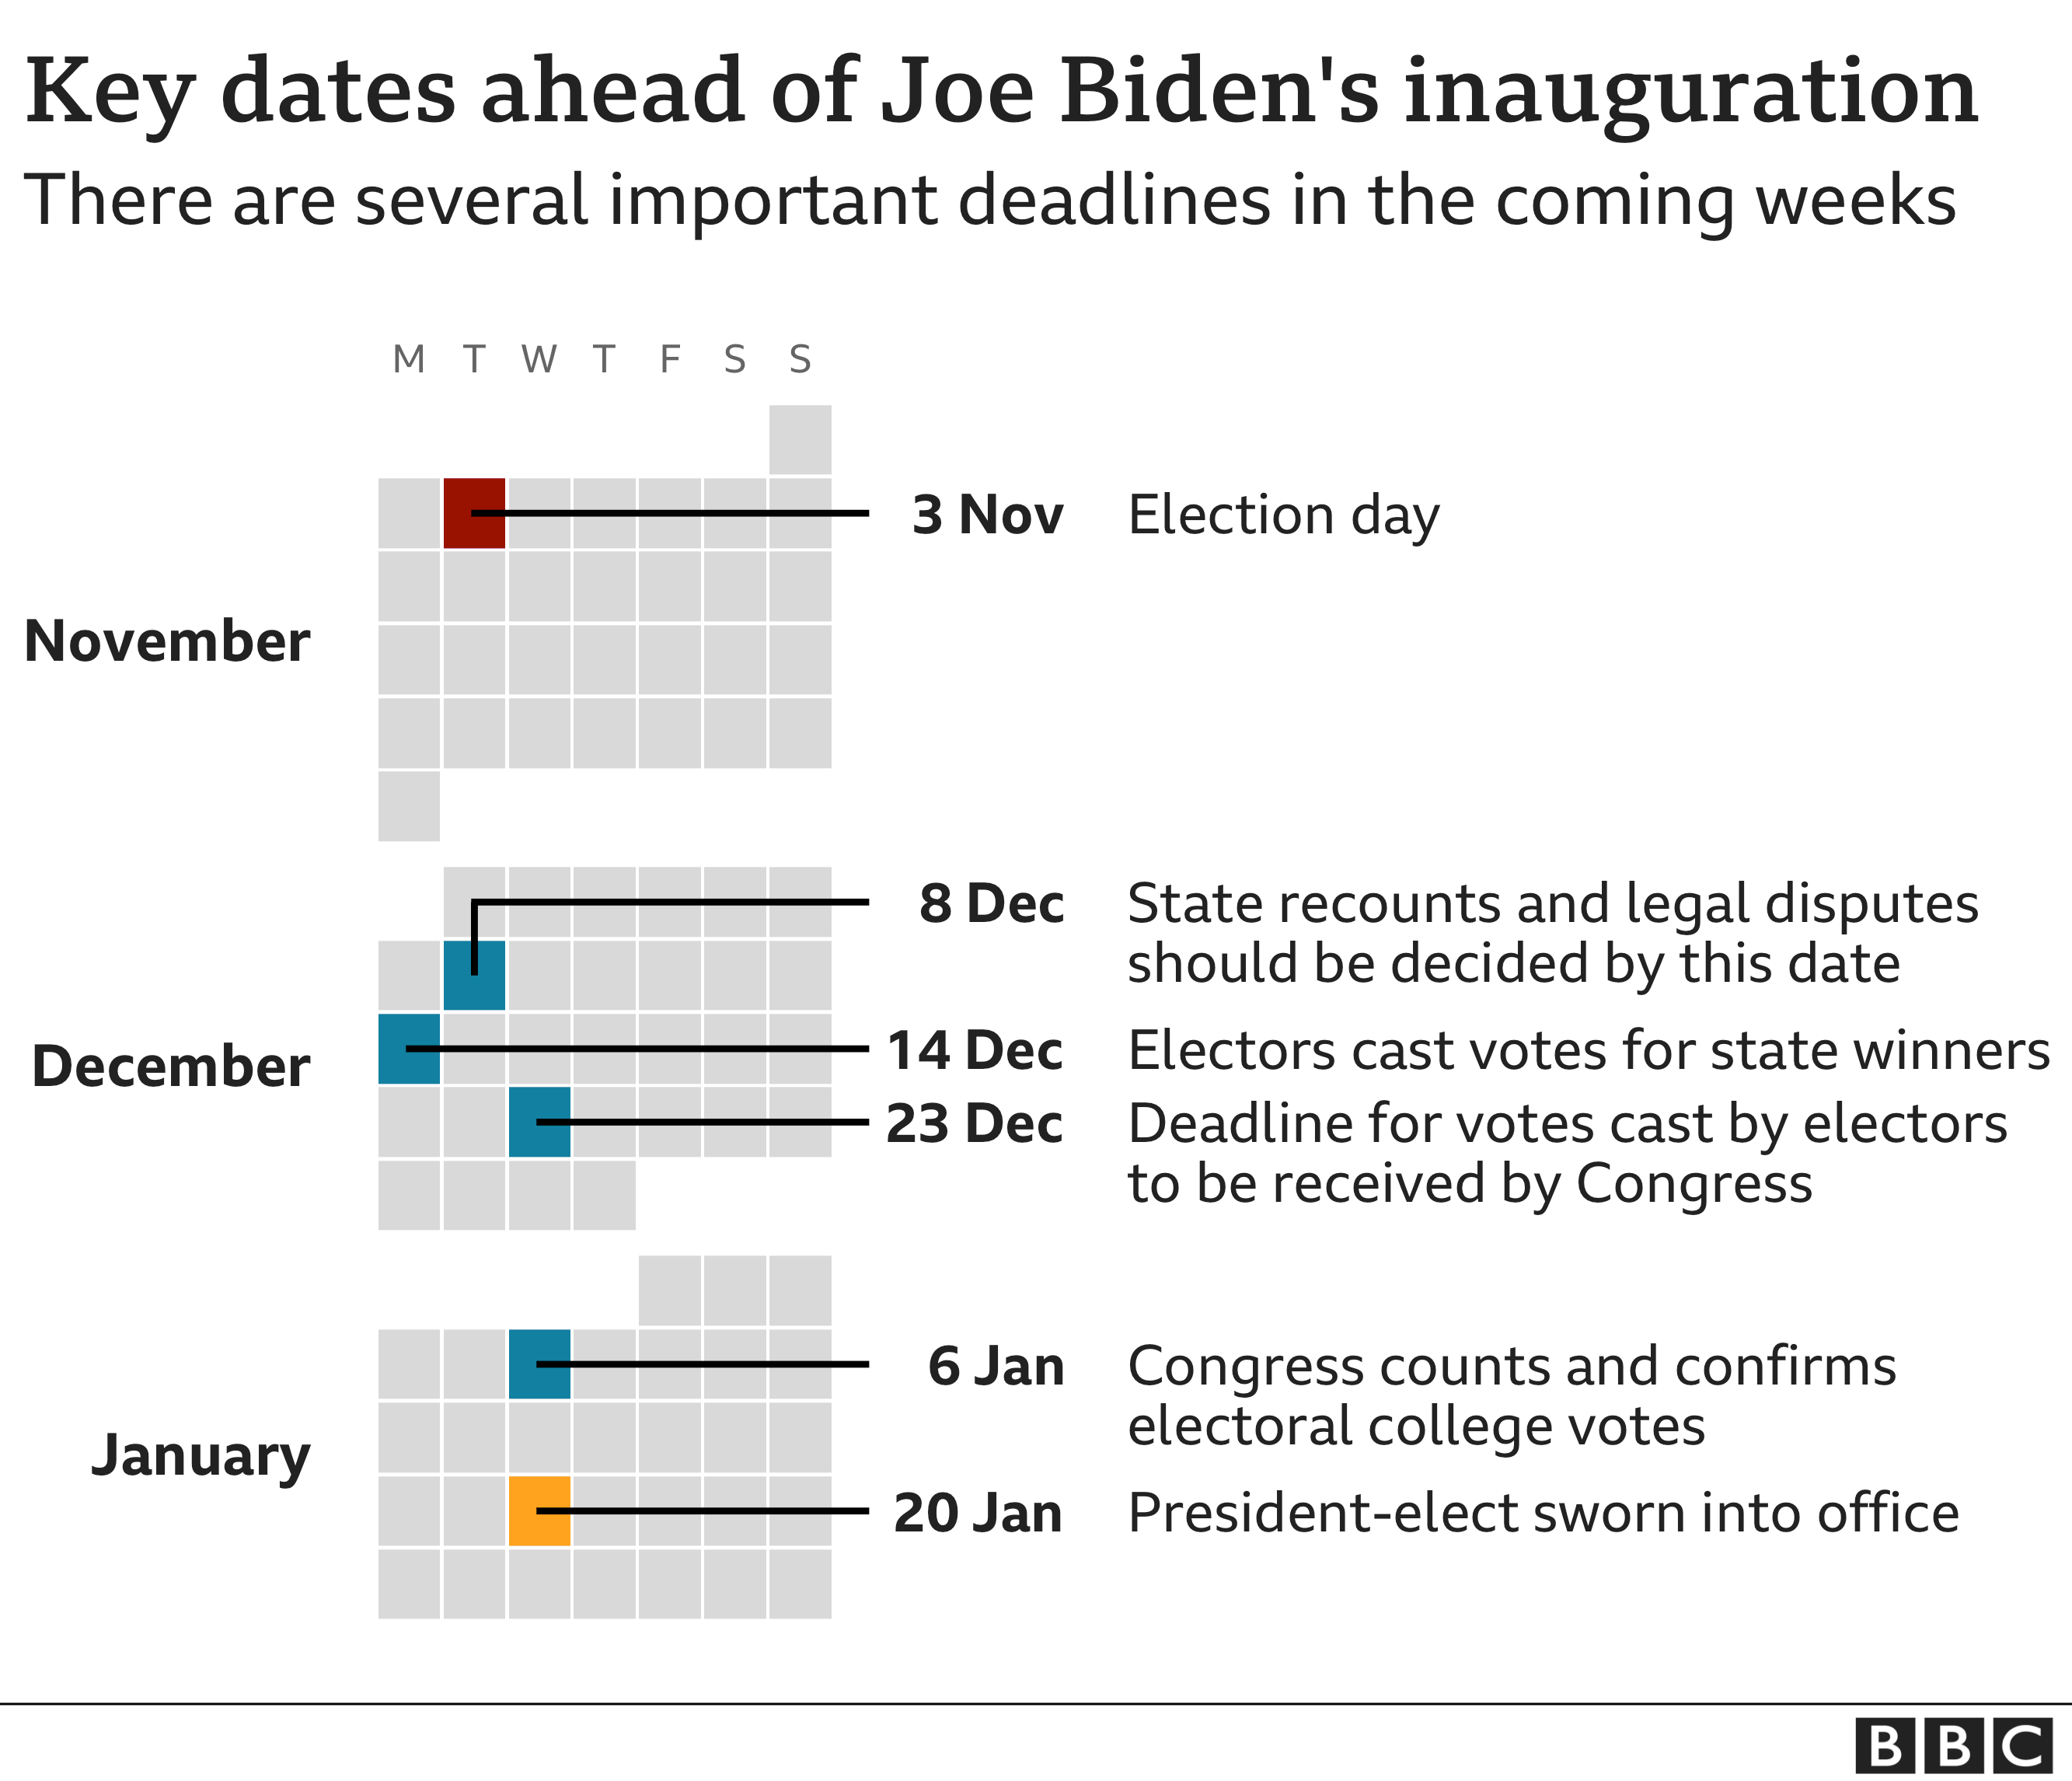 Key dates ahead of Joe Biden's inauguration